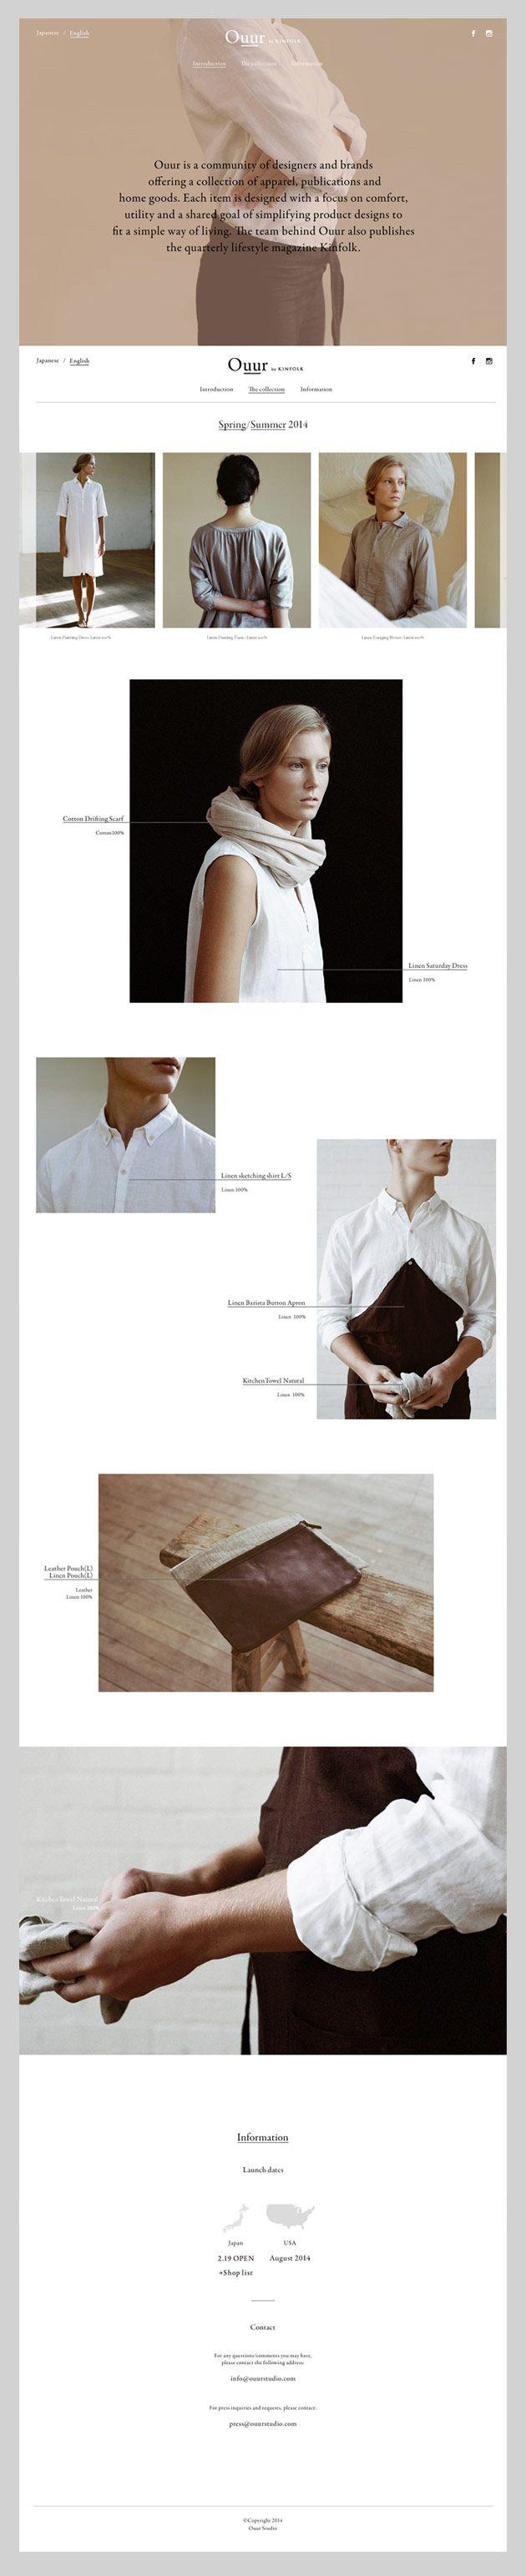 Inspiración Diseño Web 2# 03/2014 #web #webdesign #design #layout #grid #ecommerce